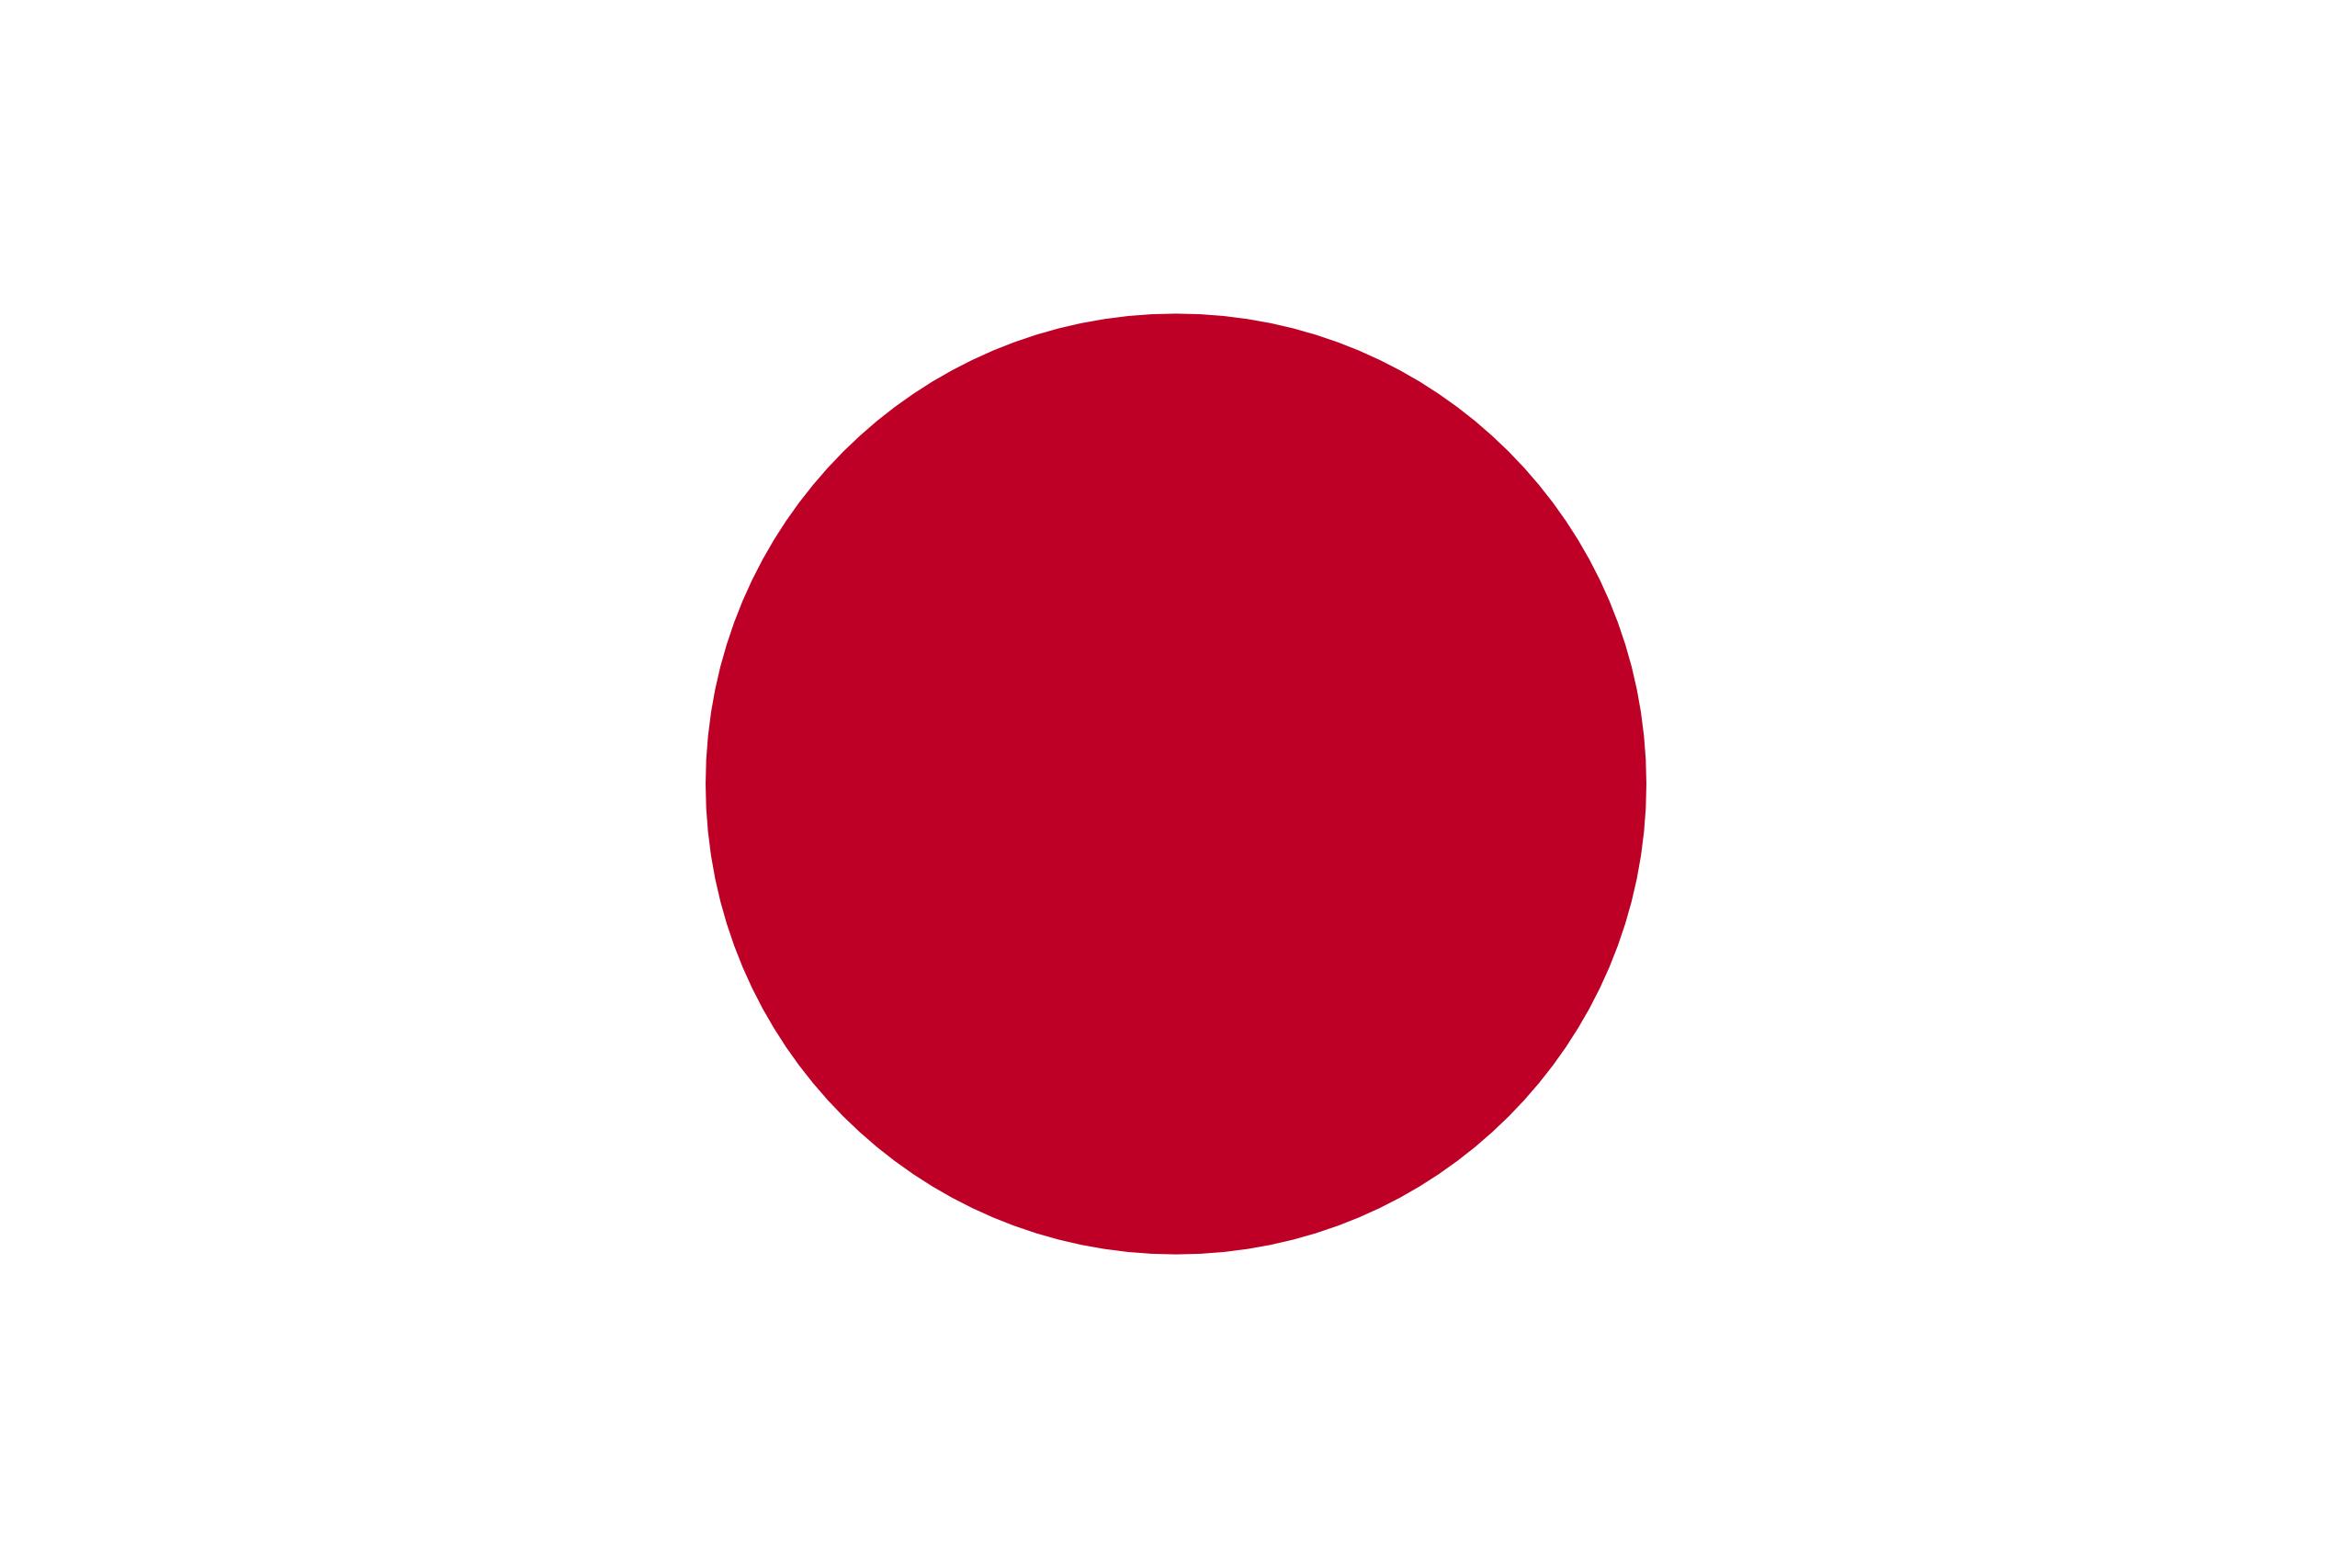 जापान, país, emblema, insignia, प्रतीक - HD वॉलपेपर - प्रोफेसर-falken.com